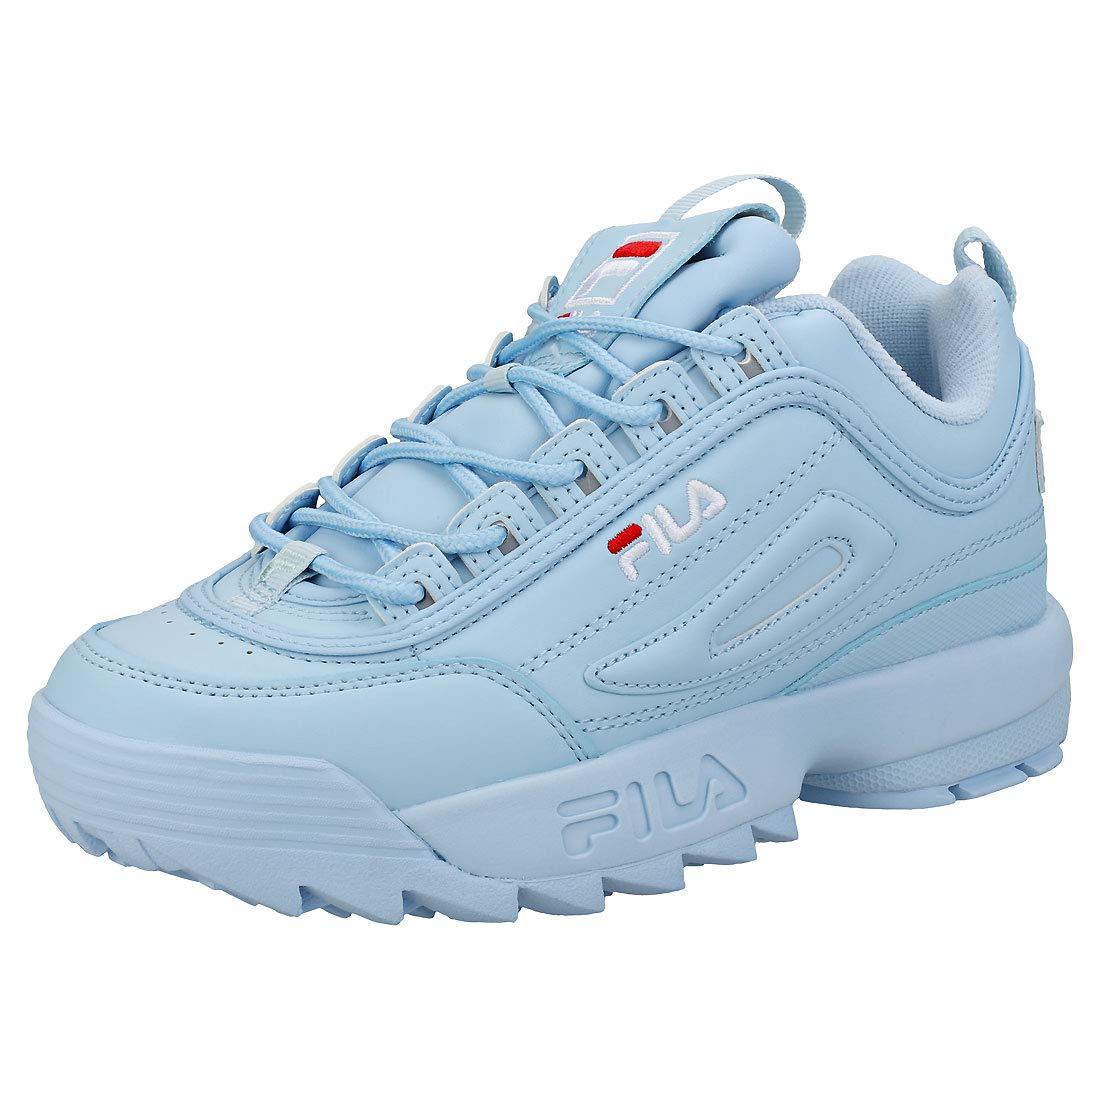 Fila Disruptor Ii Premium Womens Trainers Light Blue White ...